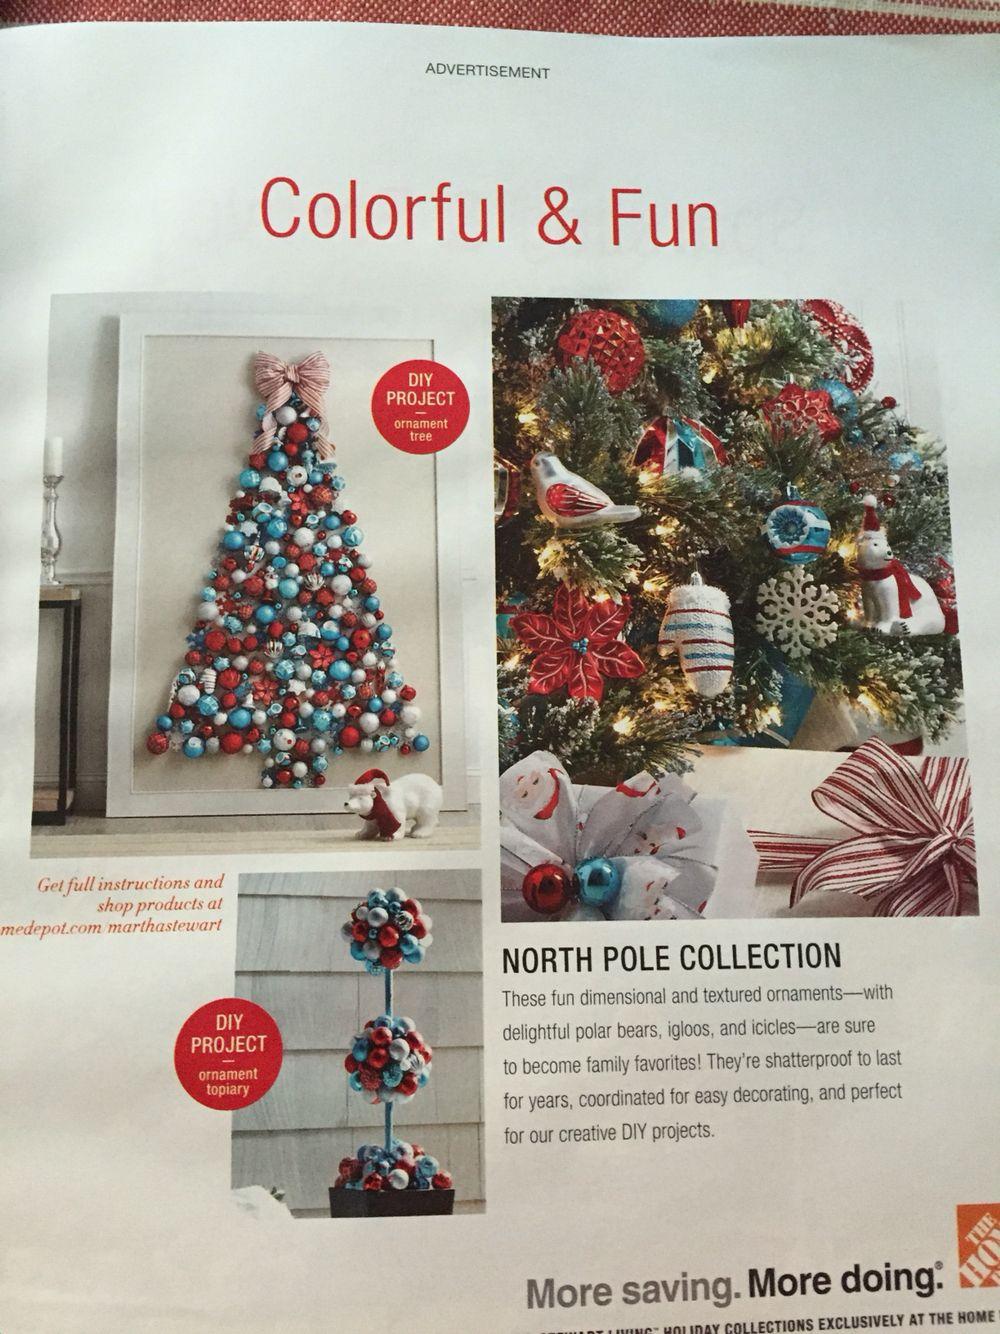 Giant d tree decor for holidays pinterest d tree